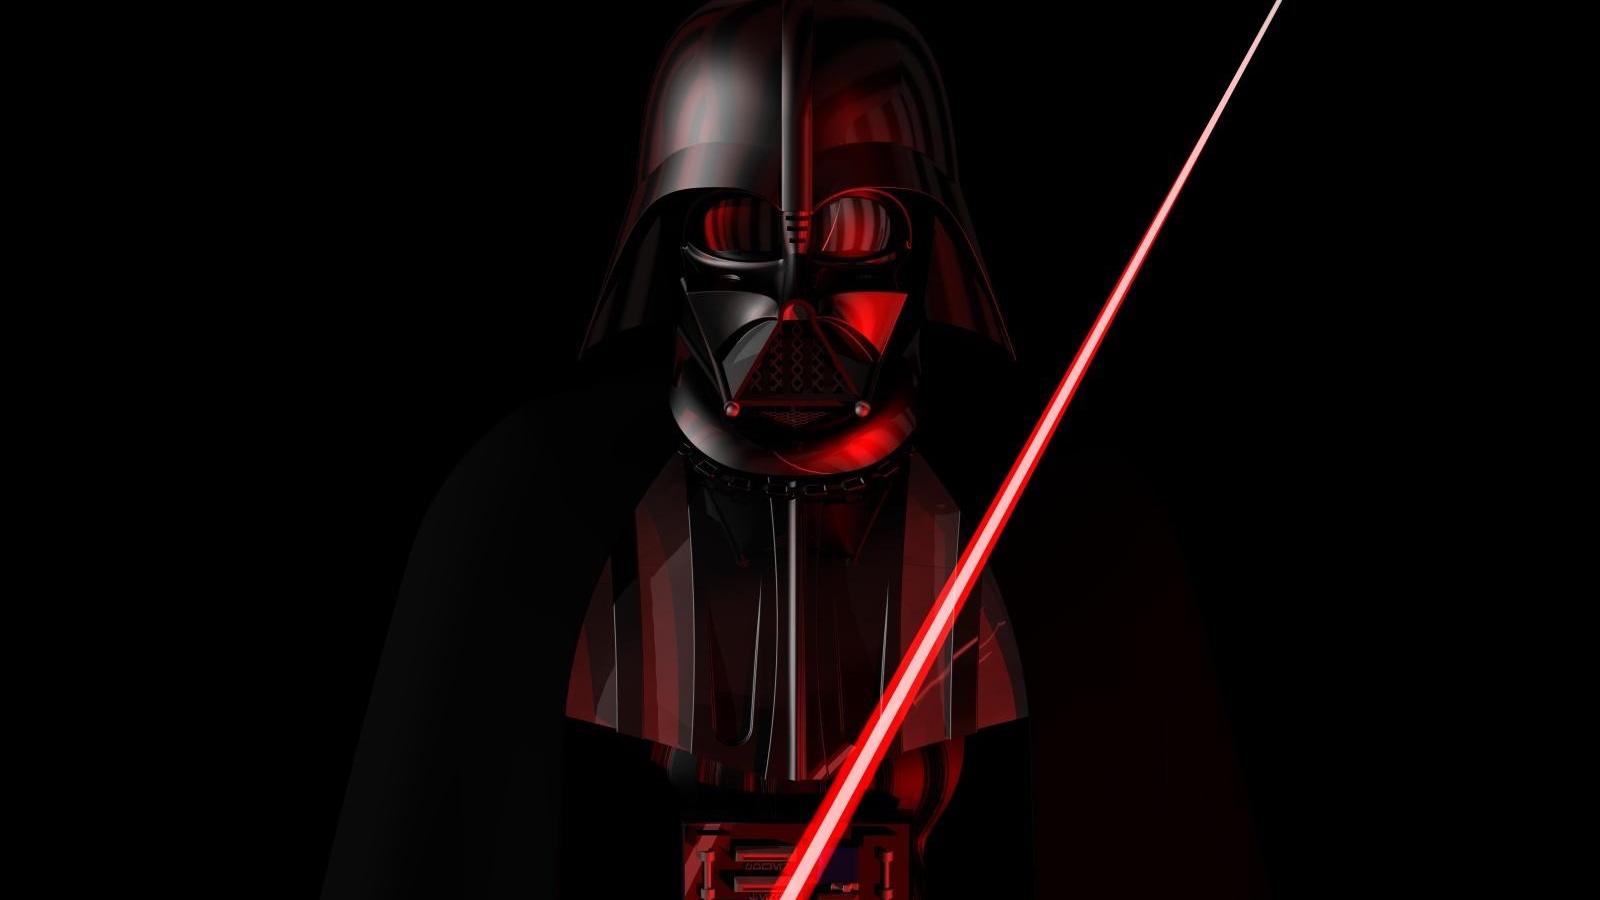 Wallpaper Star Wars Jedi Sith Laser Swords Laser Pistol